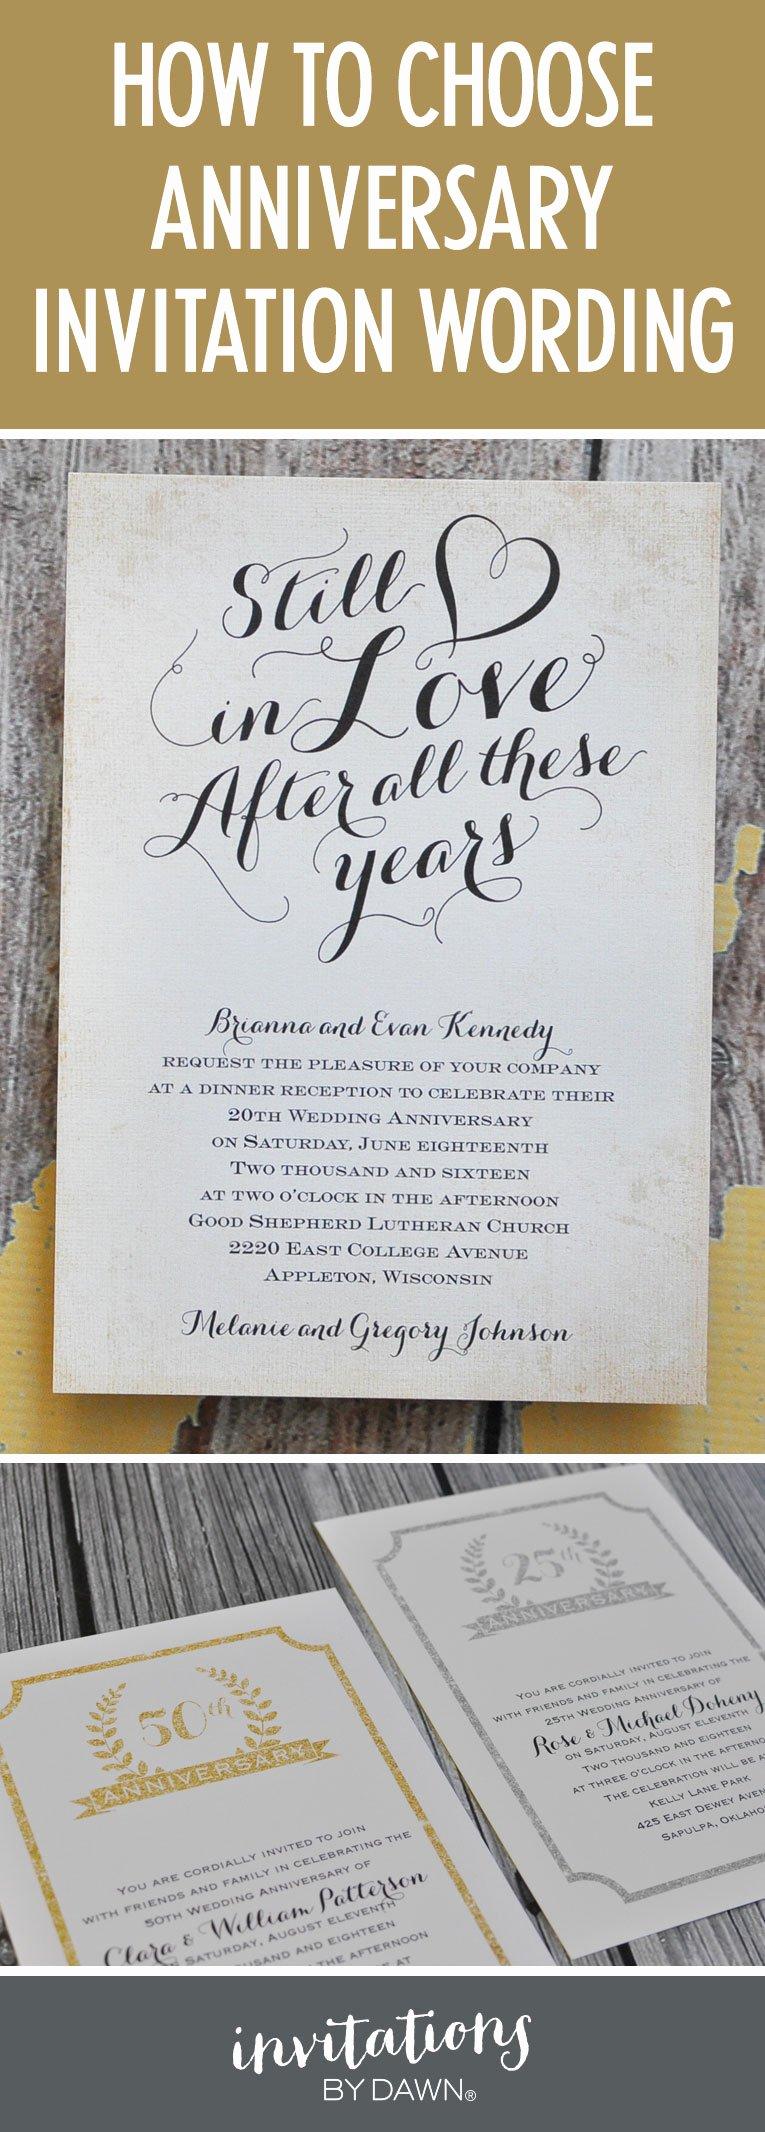 Wedding Anniversary Invitation Template Inspirational Finding the Right Wedding Anniversary Invitation Wording